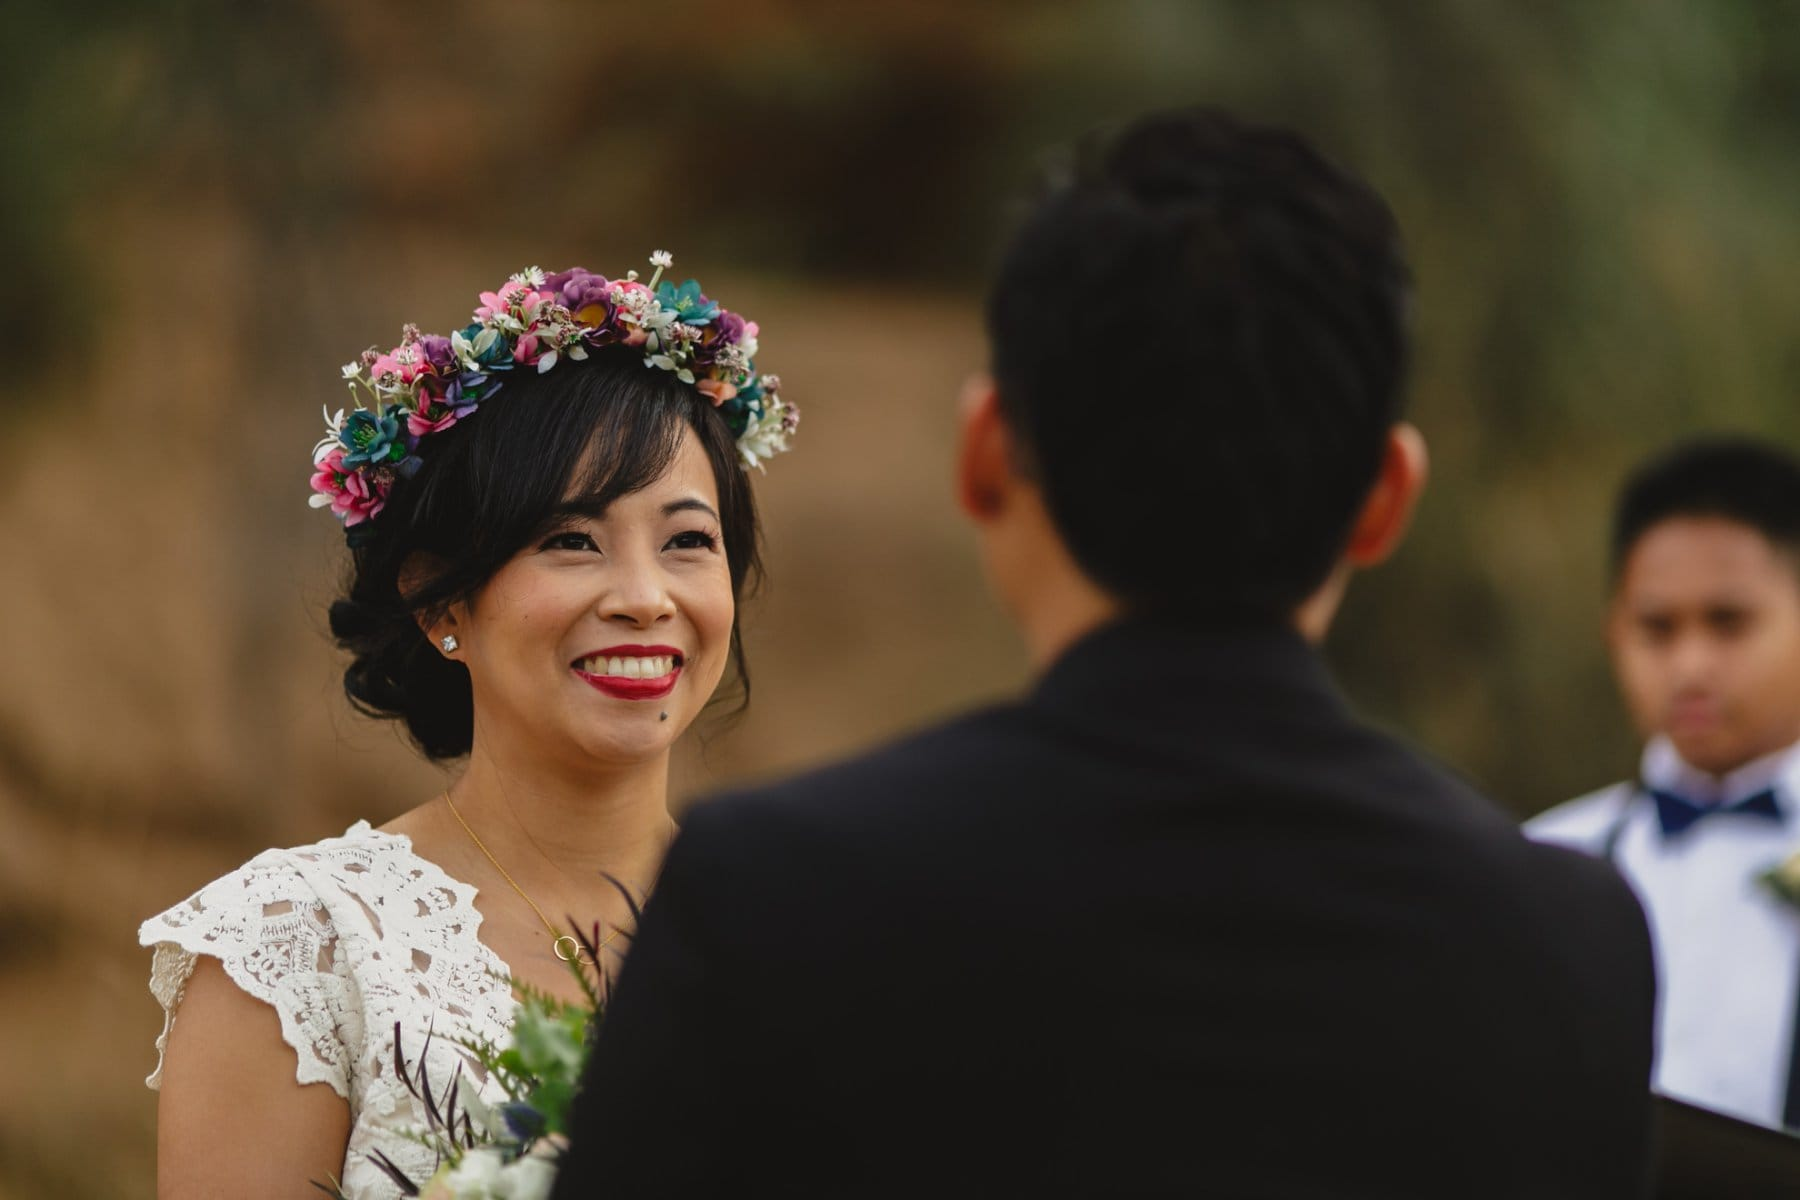 outdoor small wedding at Salt River, AZ